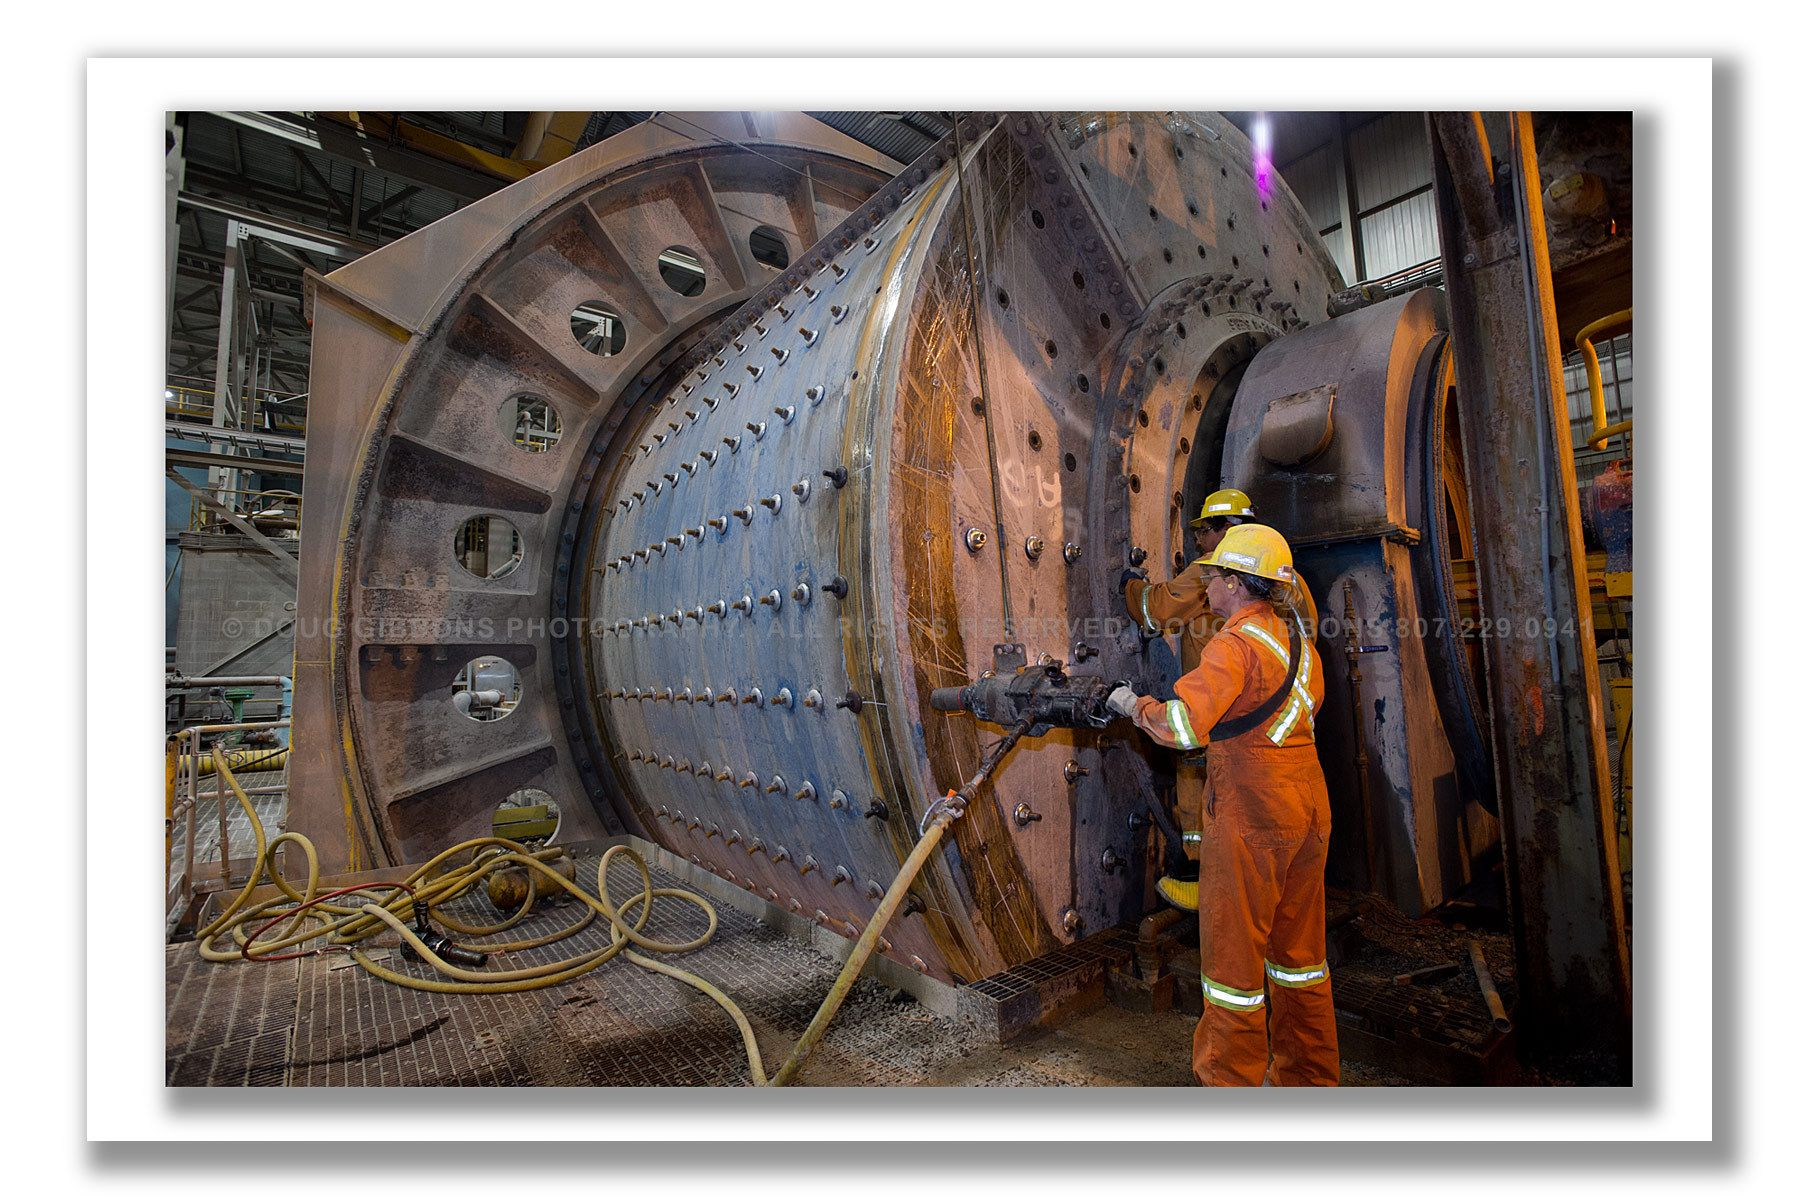 Mill maintenance